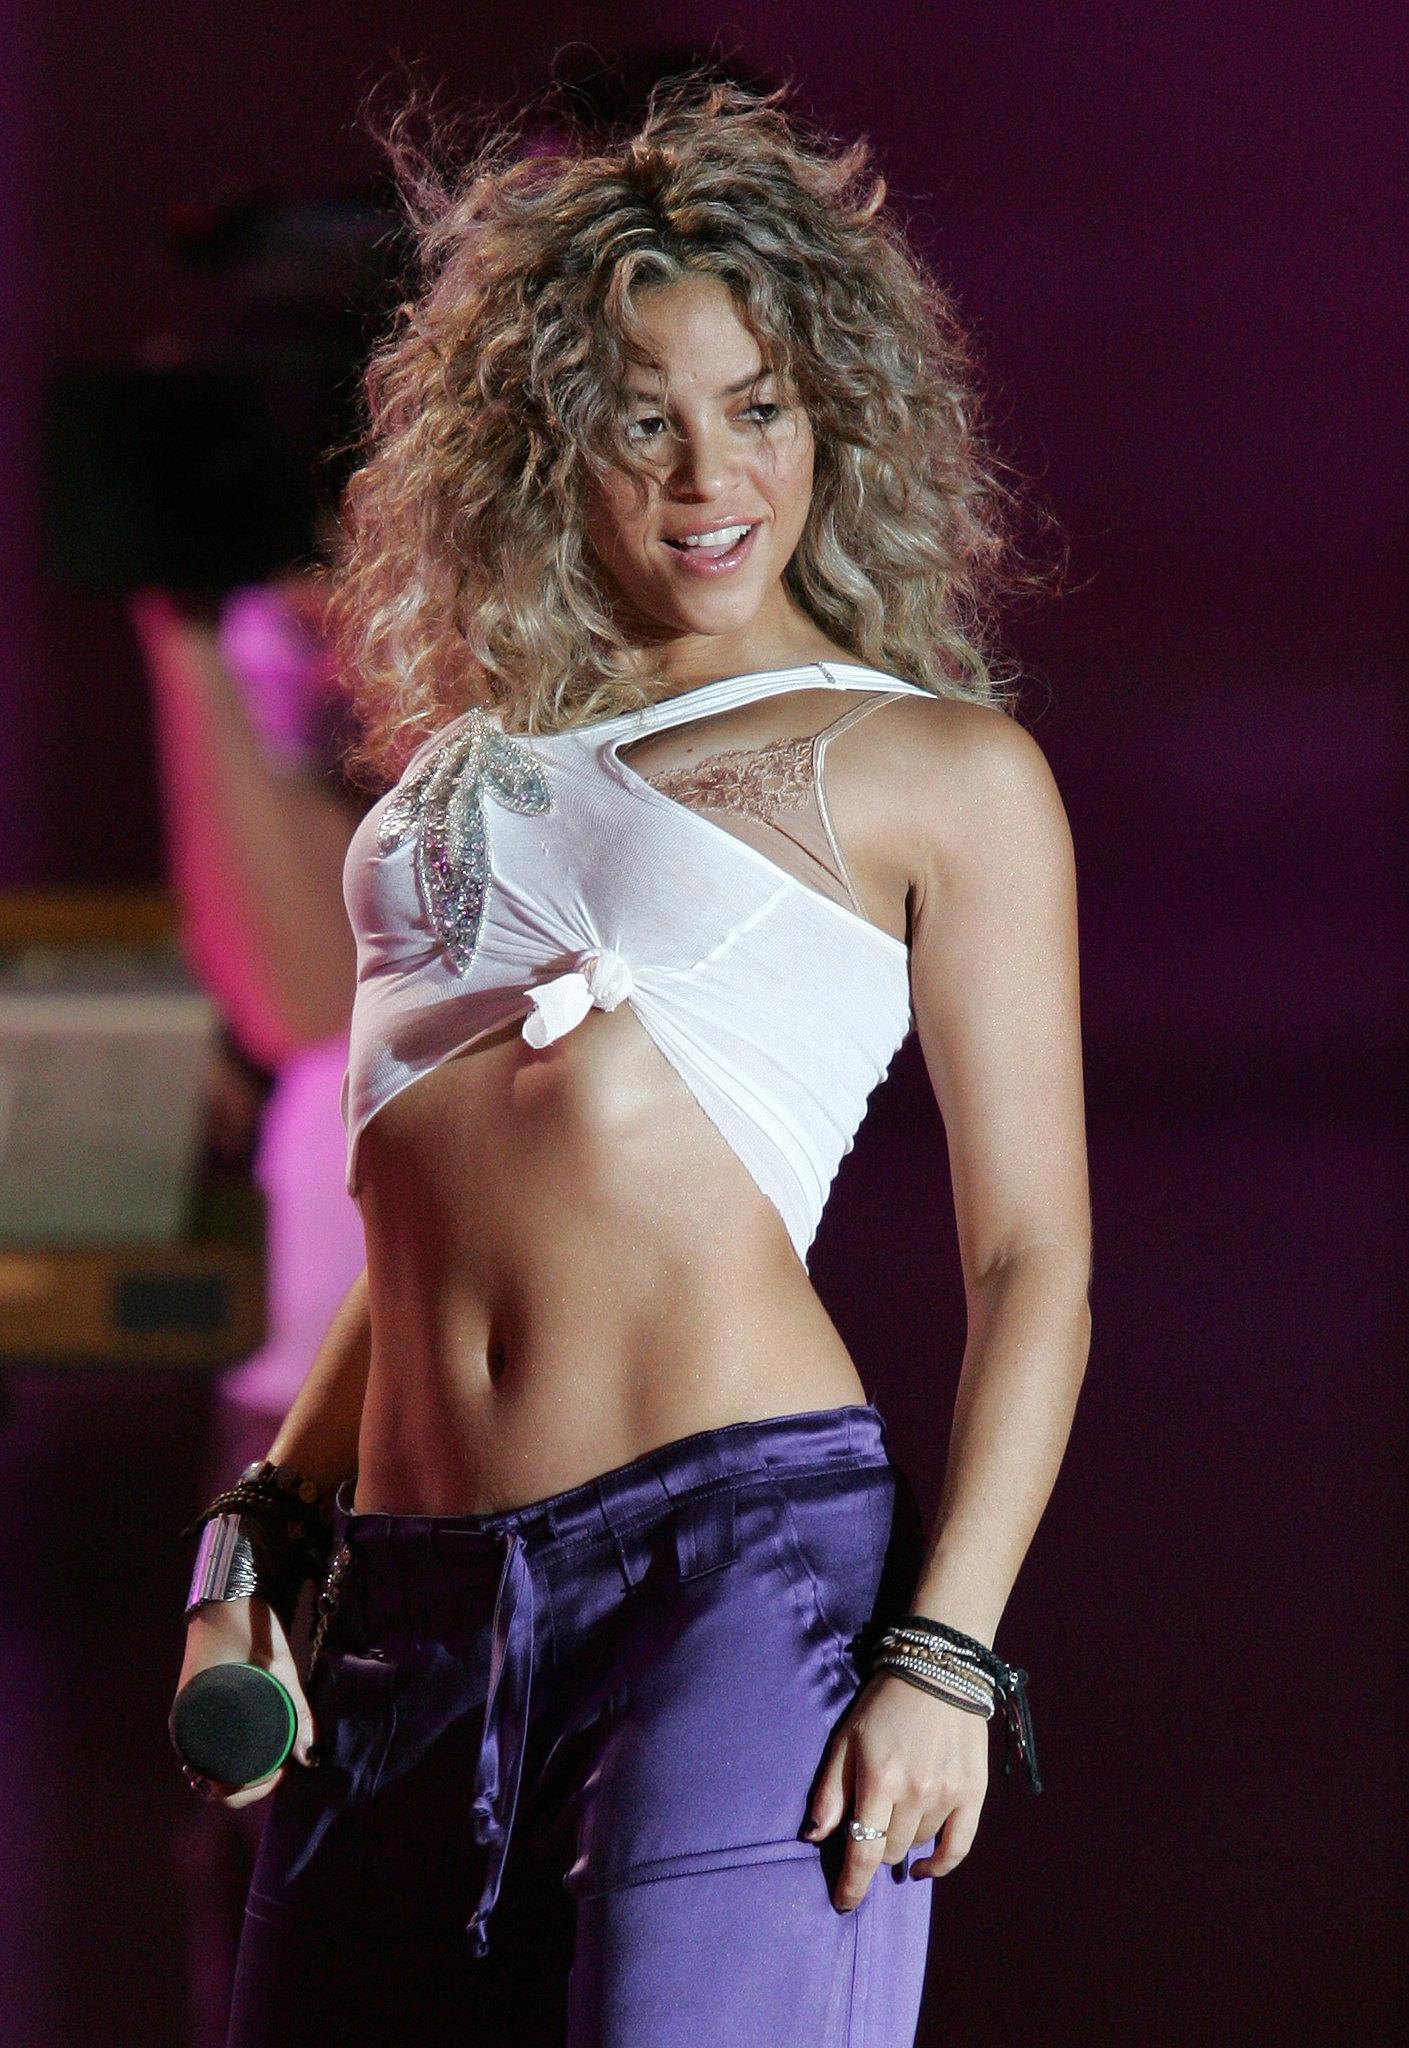 Шакира жопа фото 15 фотография